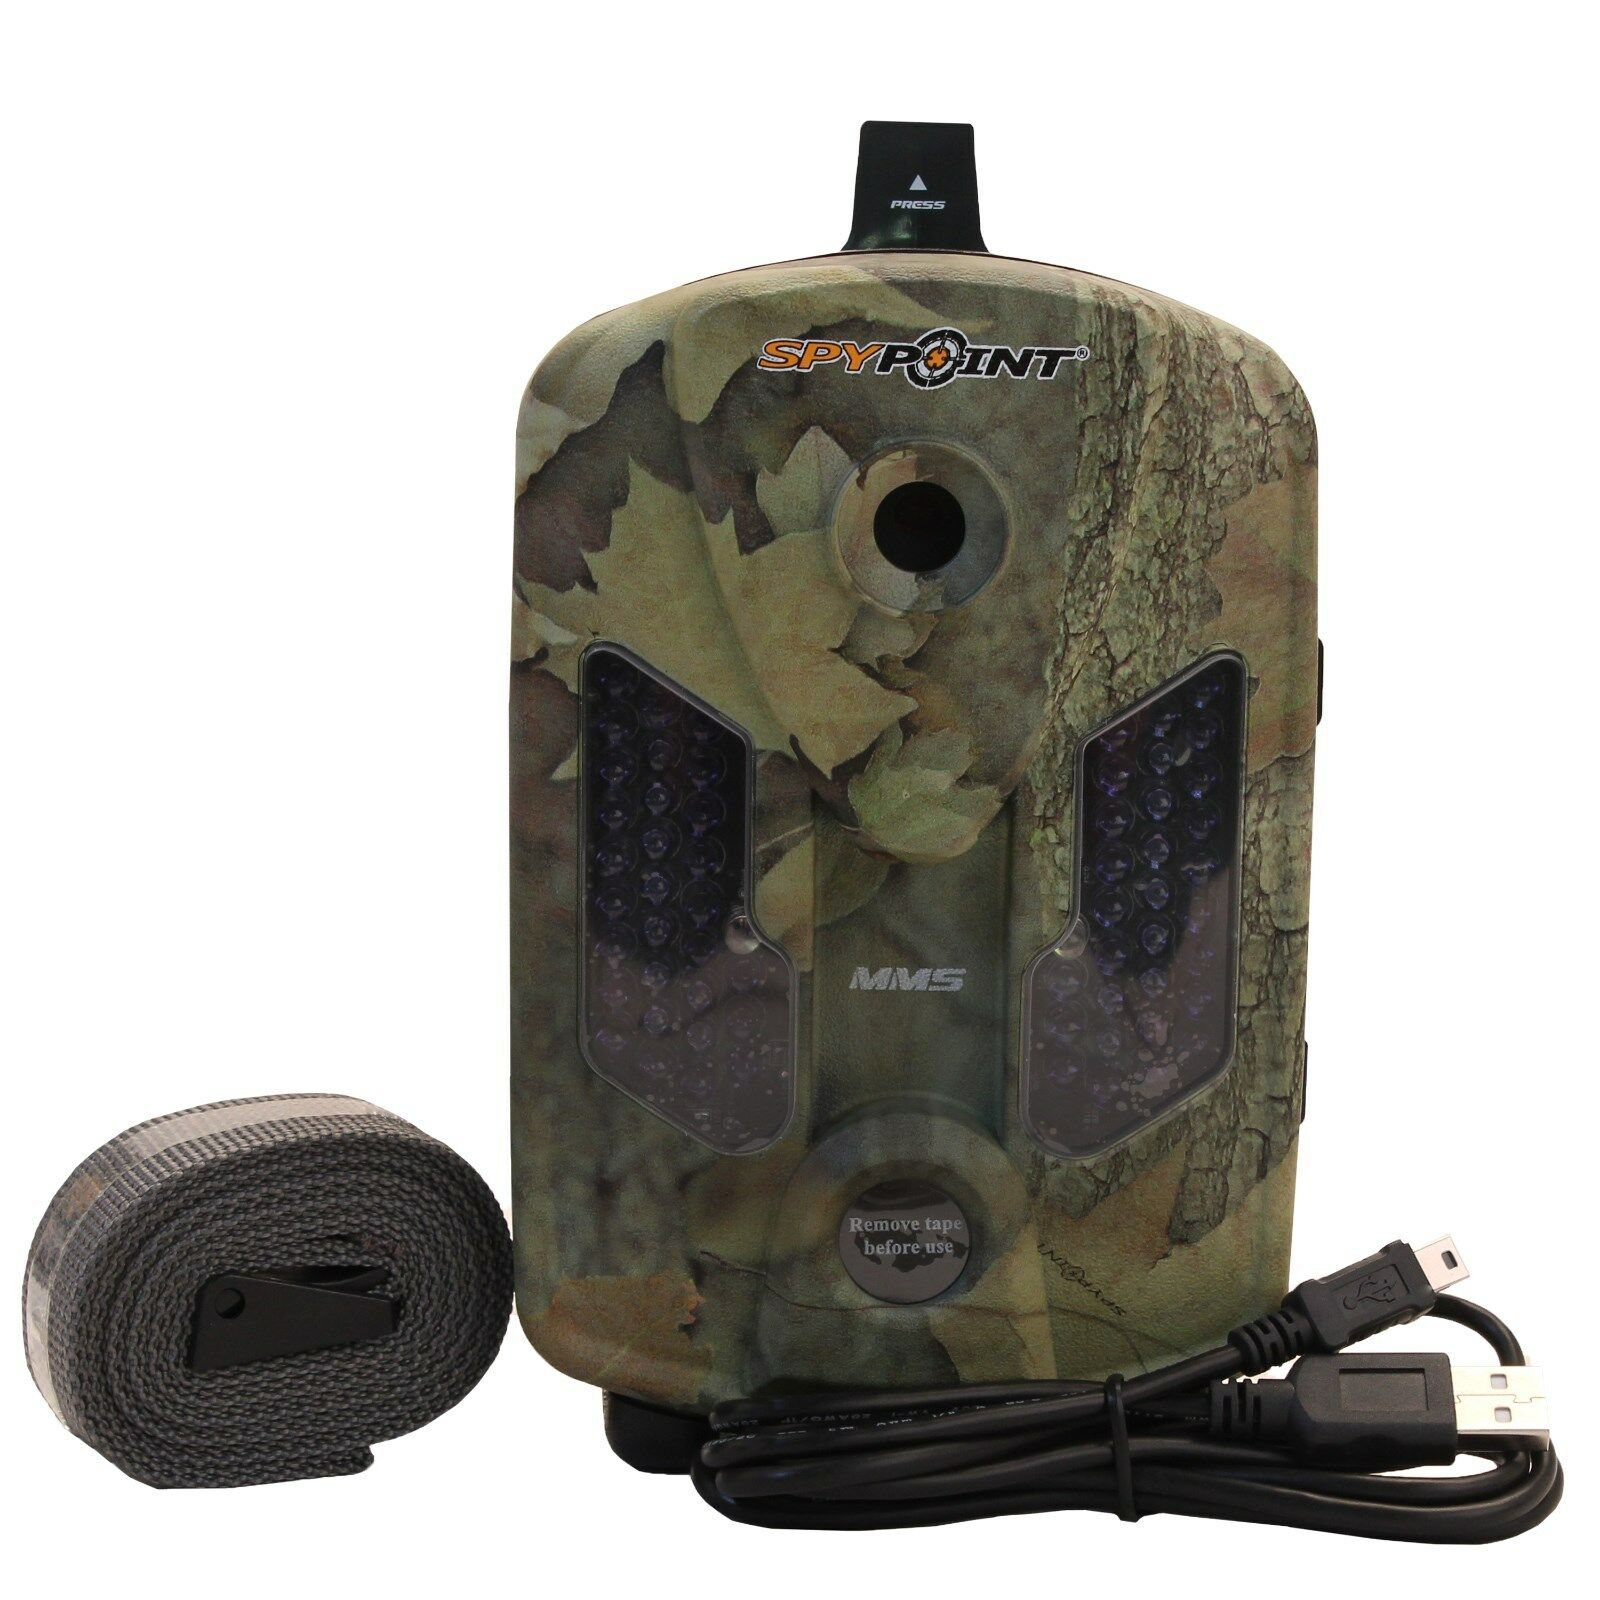 New Spypoint MMS ATT USA Celluar HD 10MP Game Camera  Video  fashion mall